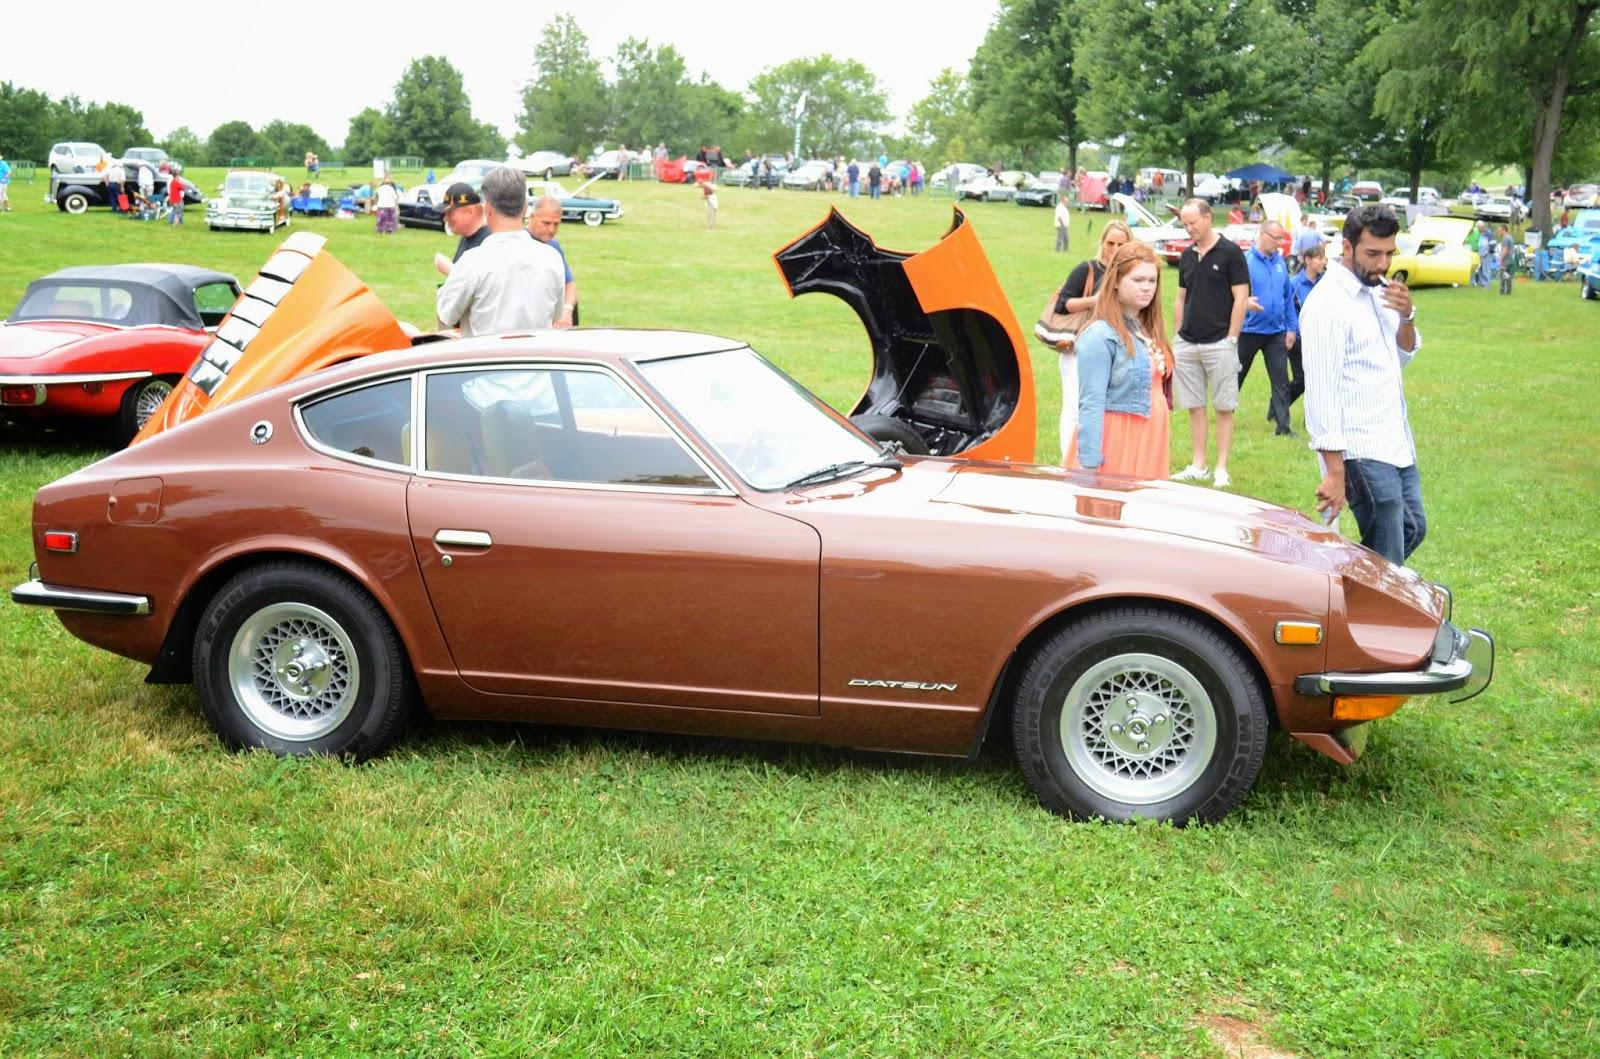 Turnerbudds Car Blog Contemporaty Sports Cars At Keeneland - Current sports cars